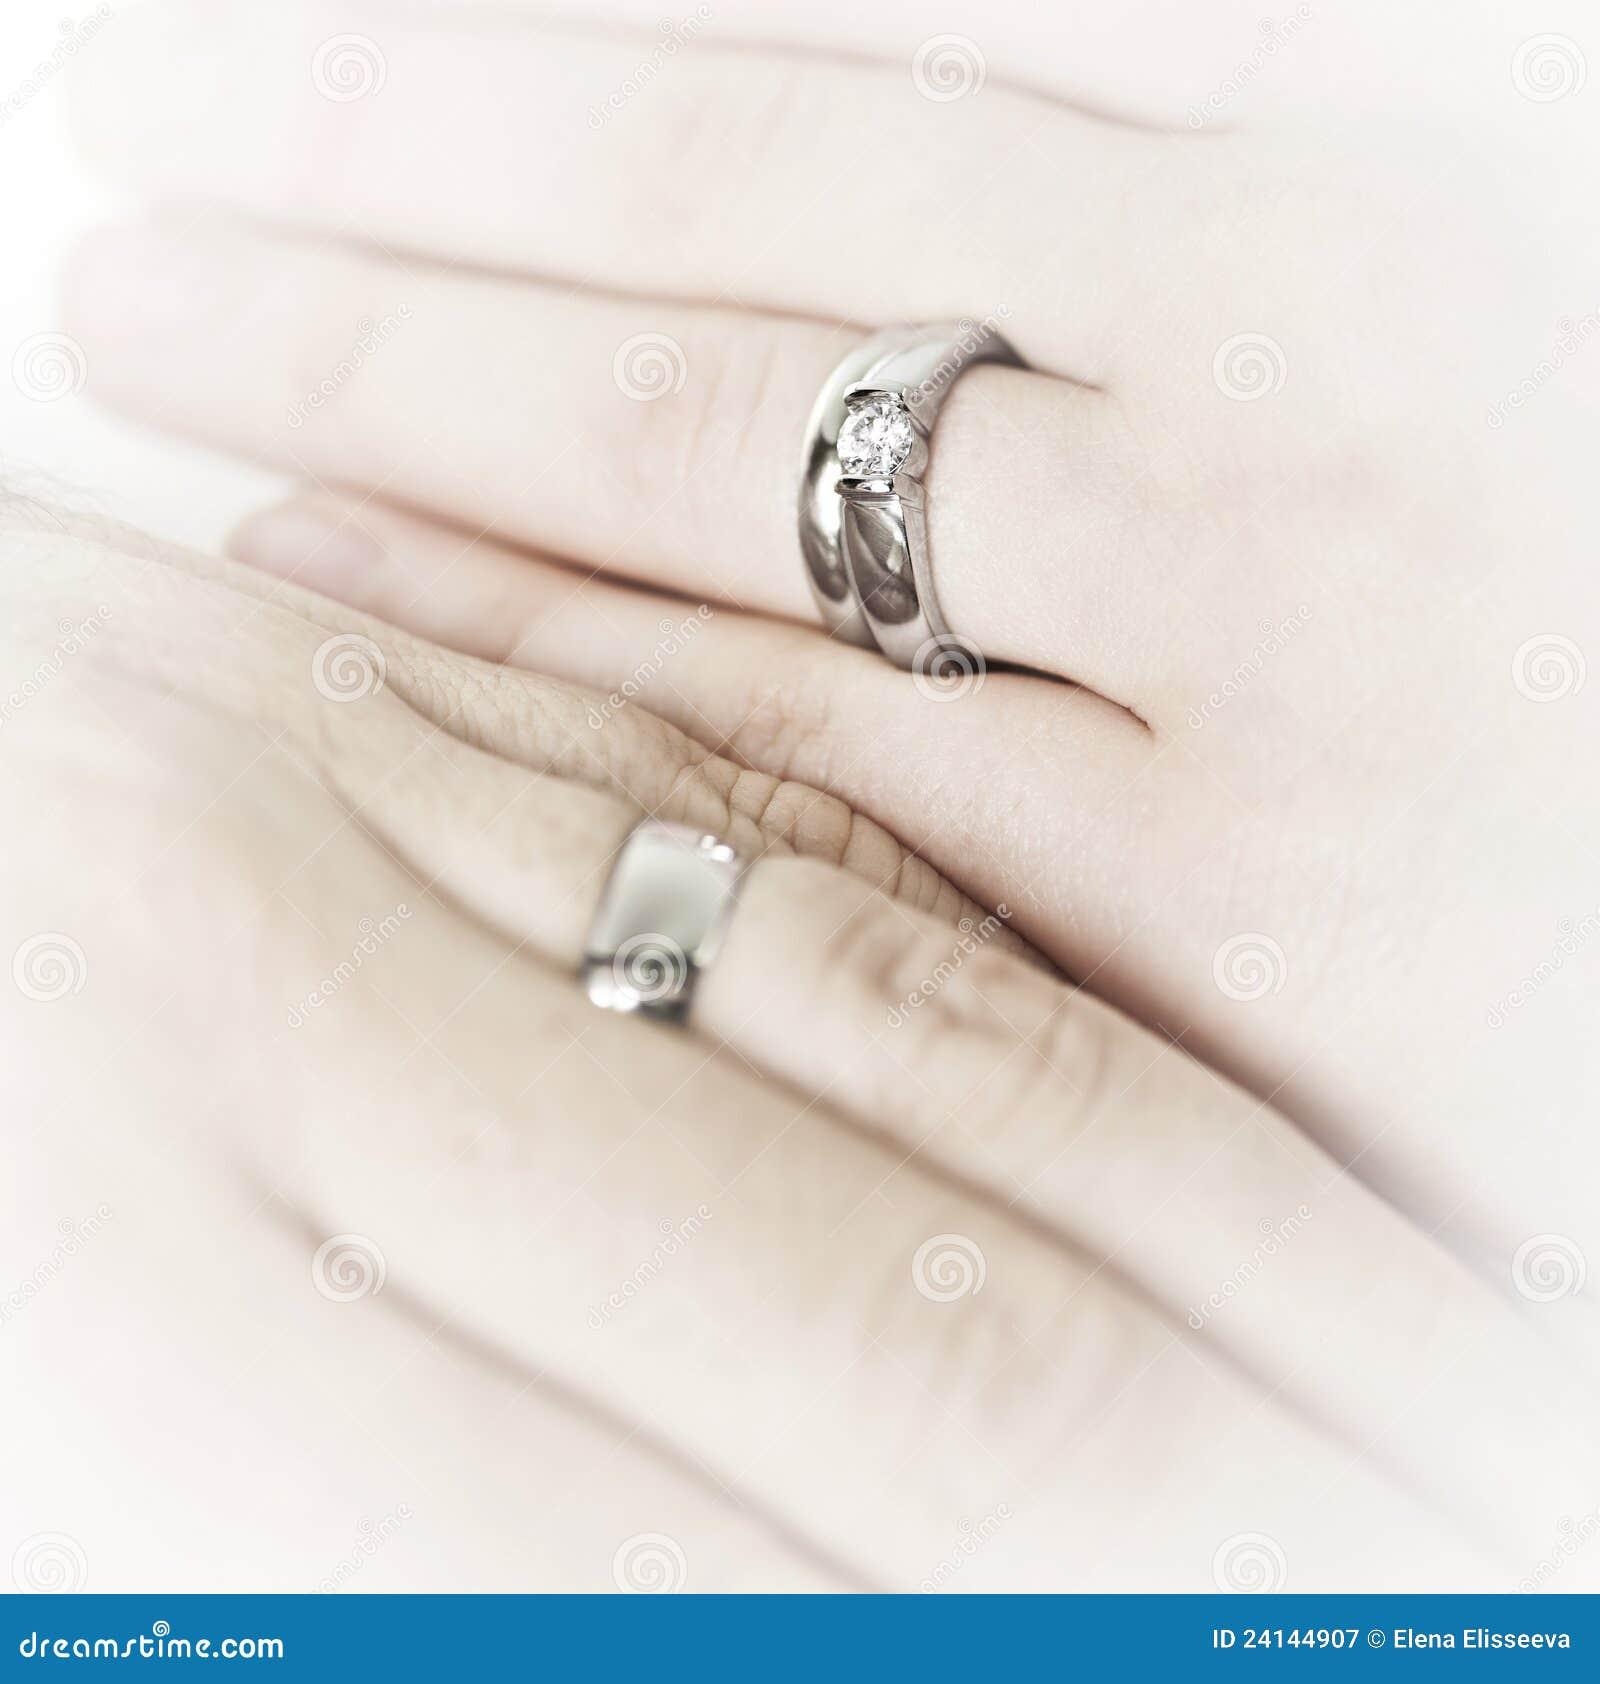 Hands Wearing Wedding Rings Stock Image